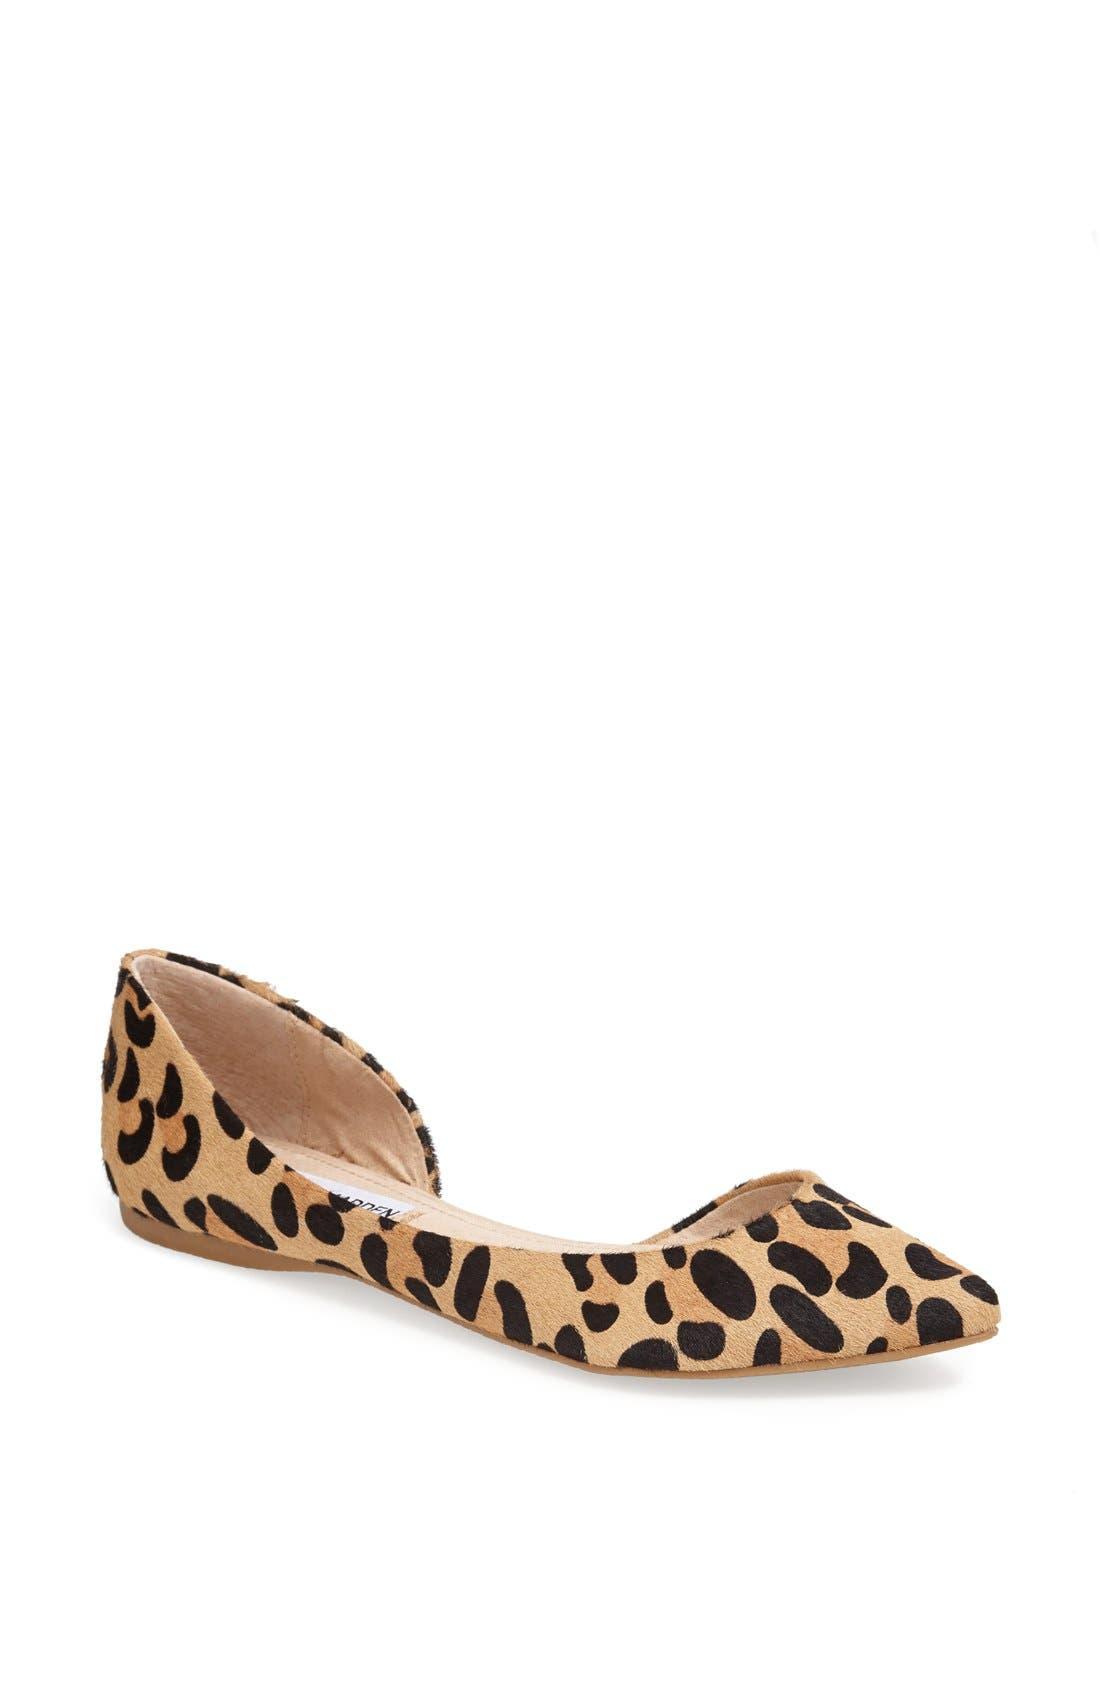 Main Image - Steve Madden 'Elusion' Leopard Print Calf Hair Half d'Orsay